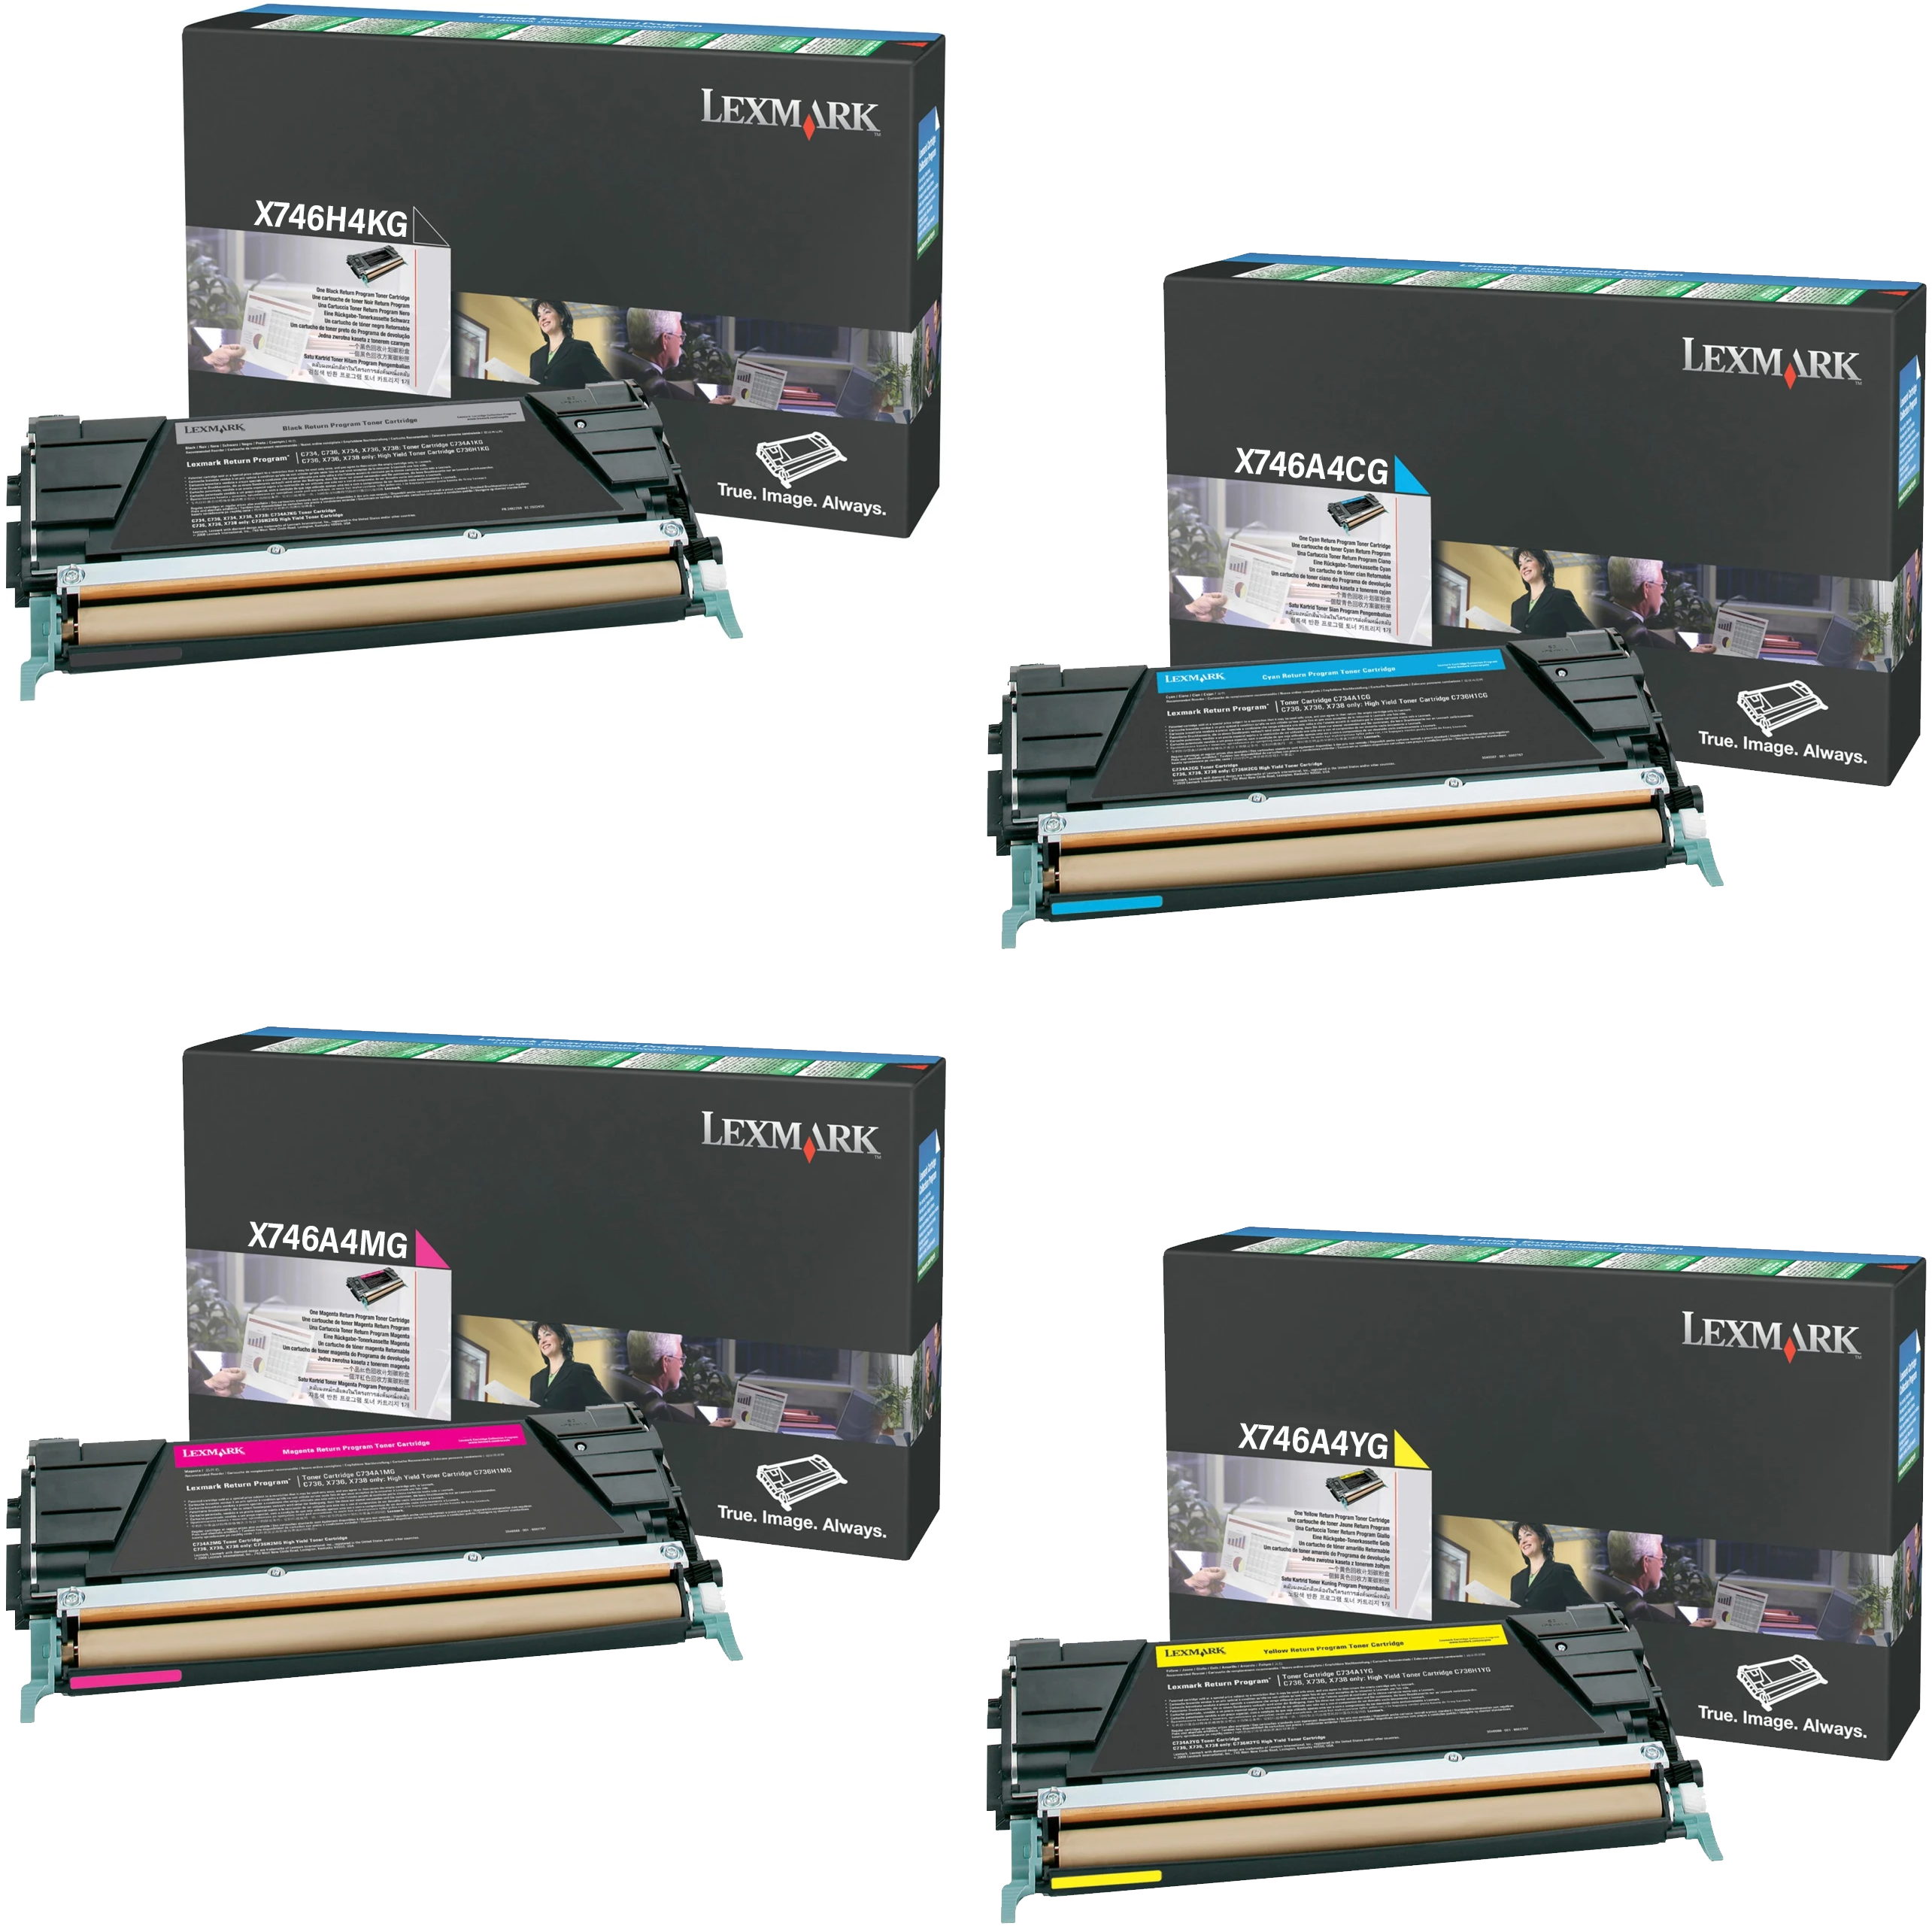 Lexmark X746A4 Set | X746H4KG X746A4CG X746A4MG X746A4YG | Original Lexmark Toner Cartridges – High-Yield Black, Cyan, Magenta, Yellow